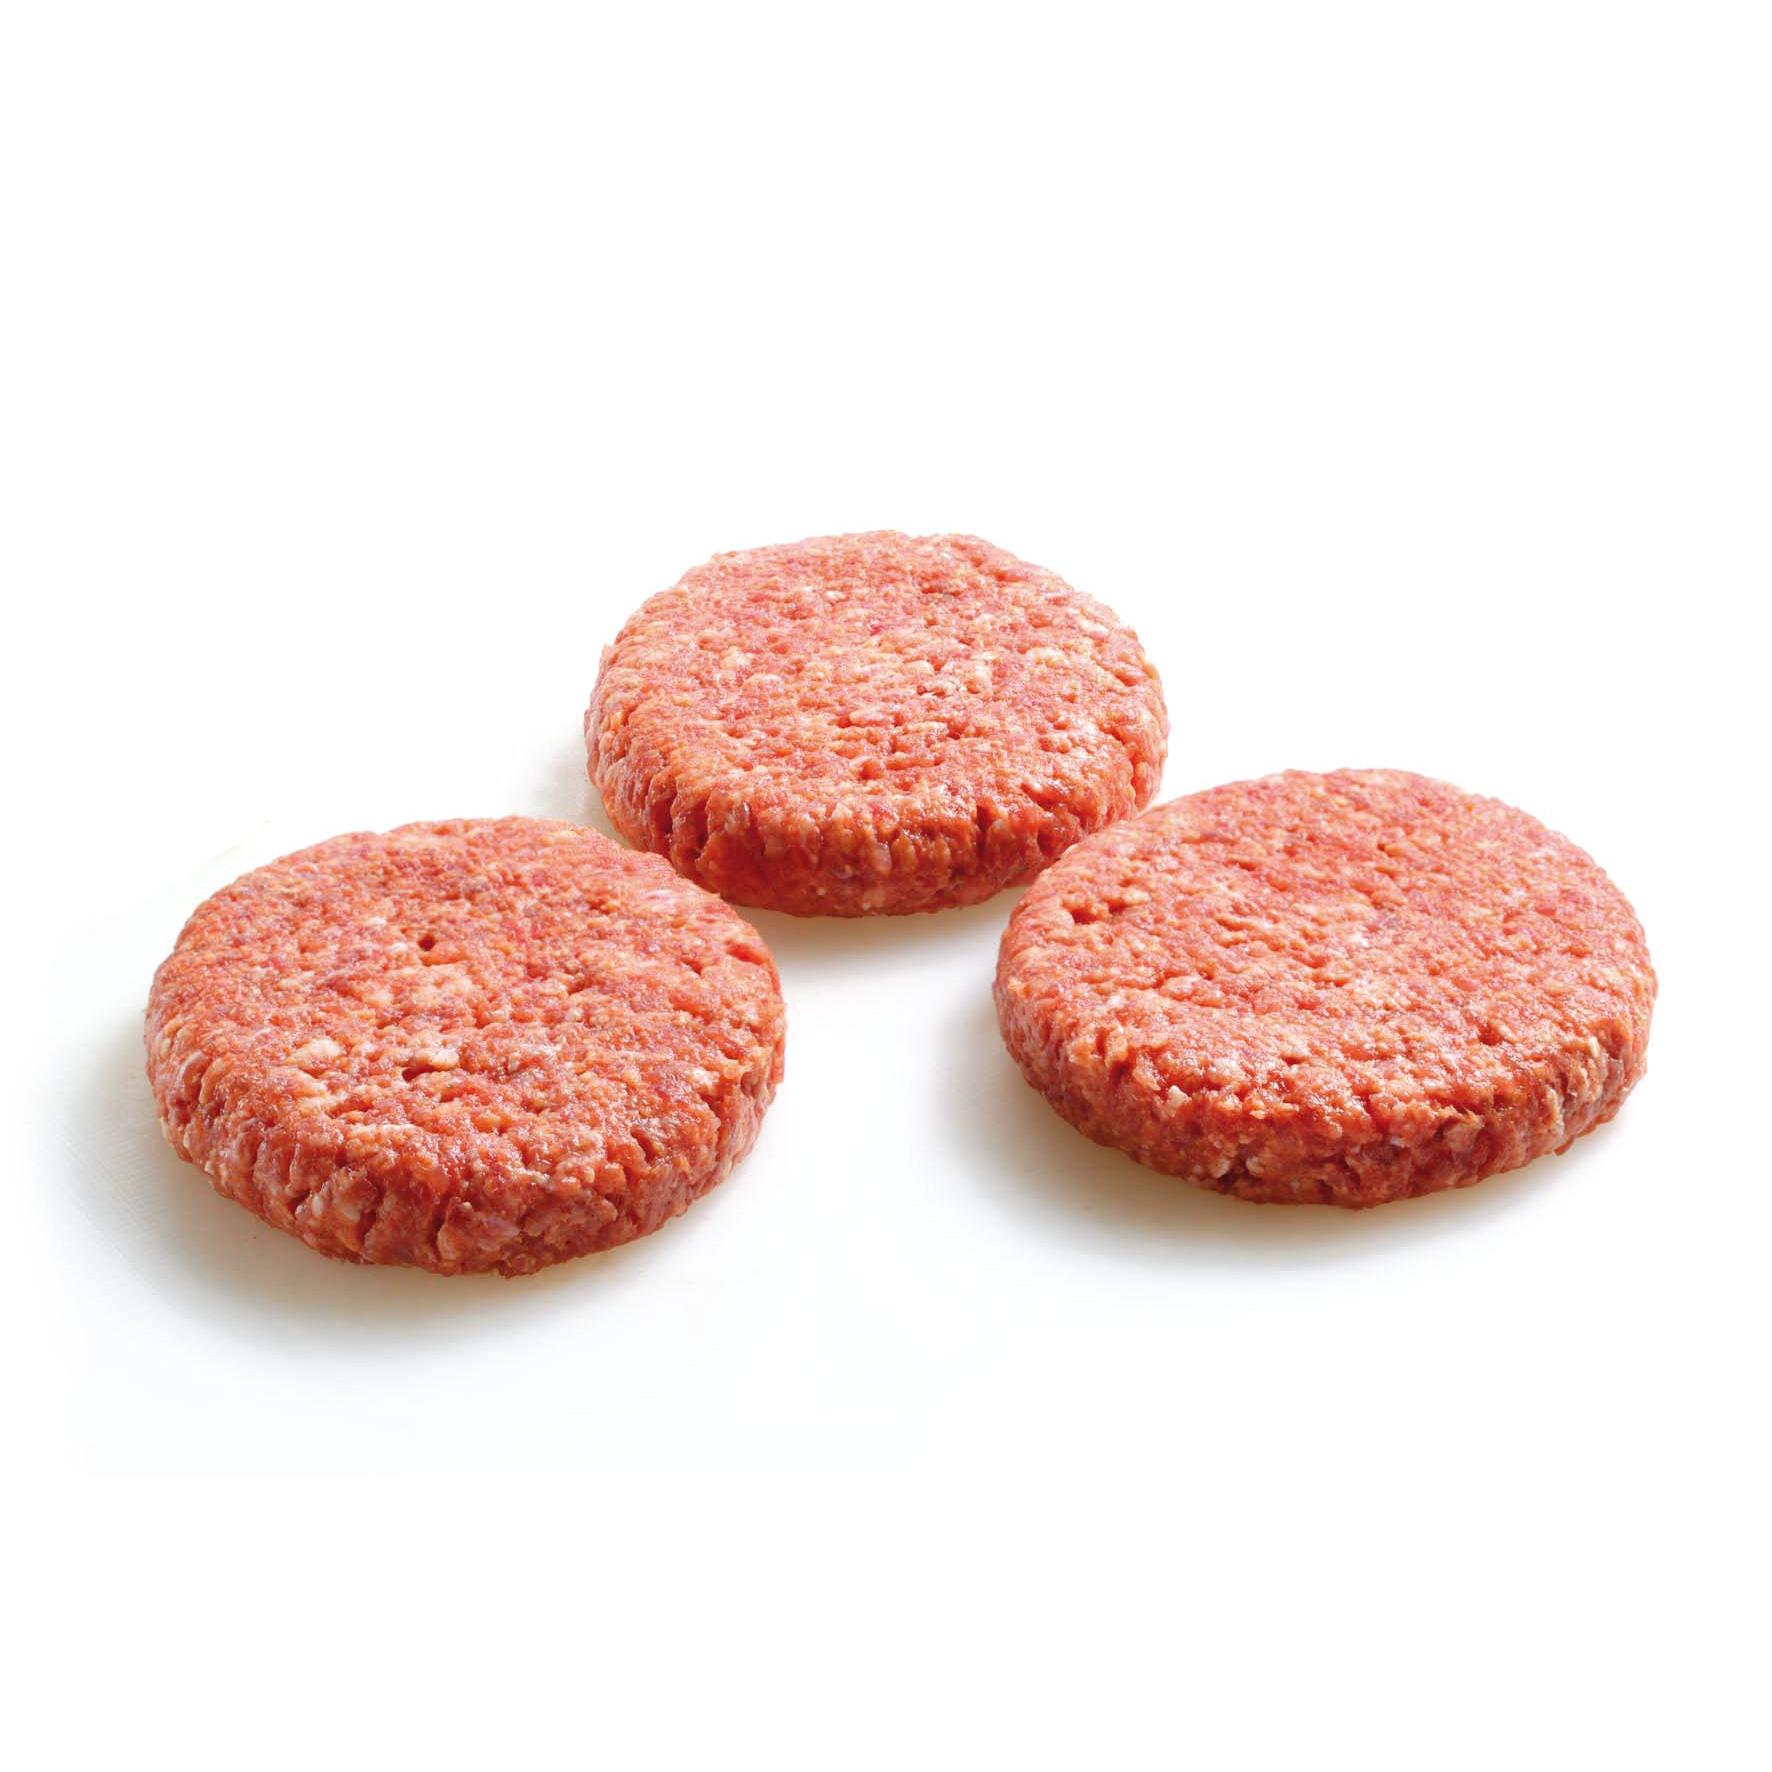 Productafbeelding Classerund burger - Classe Slager